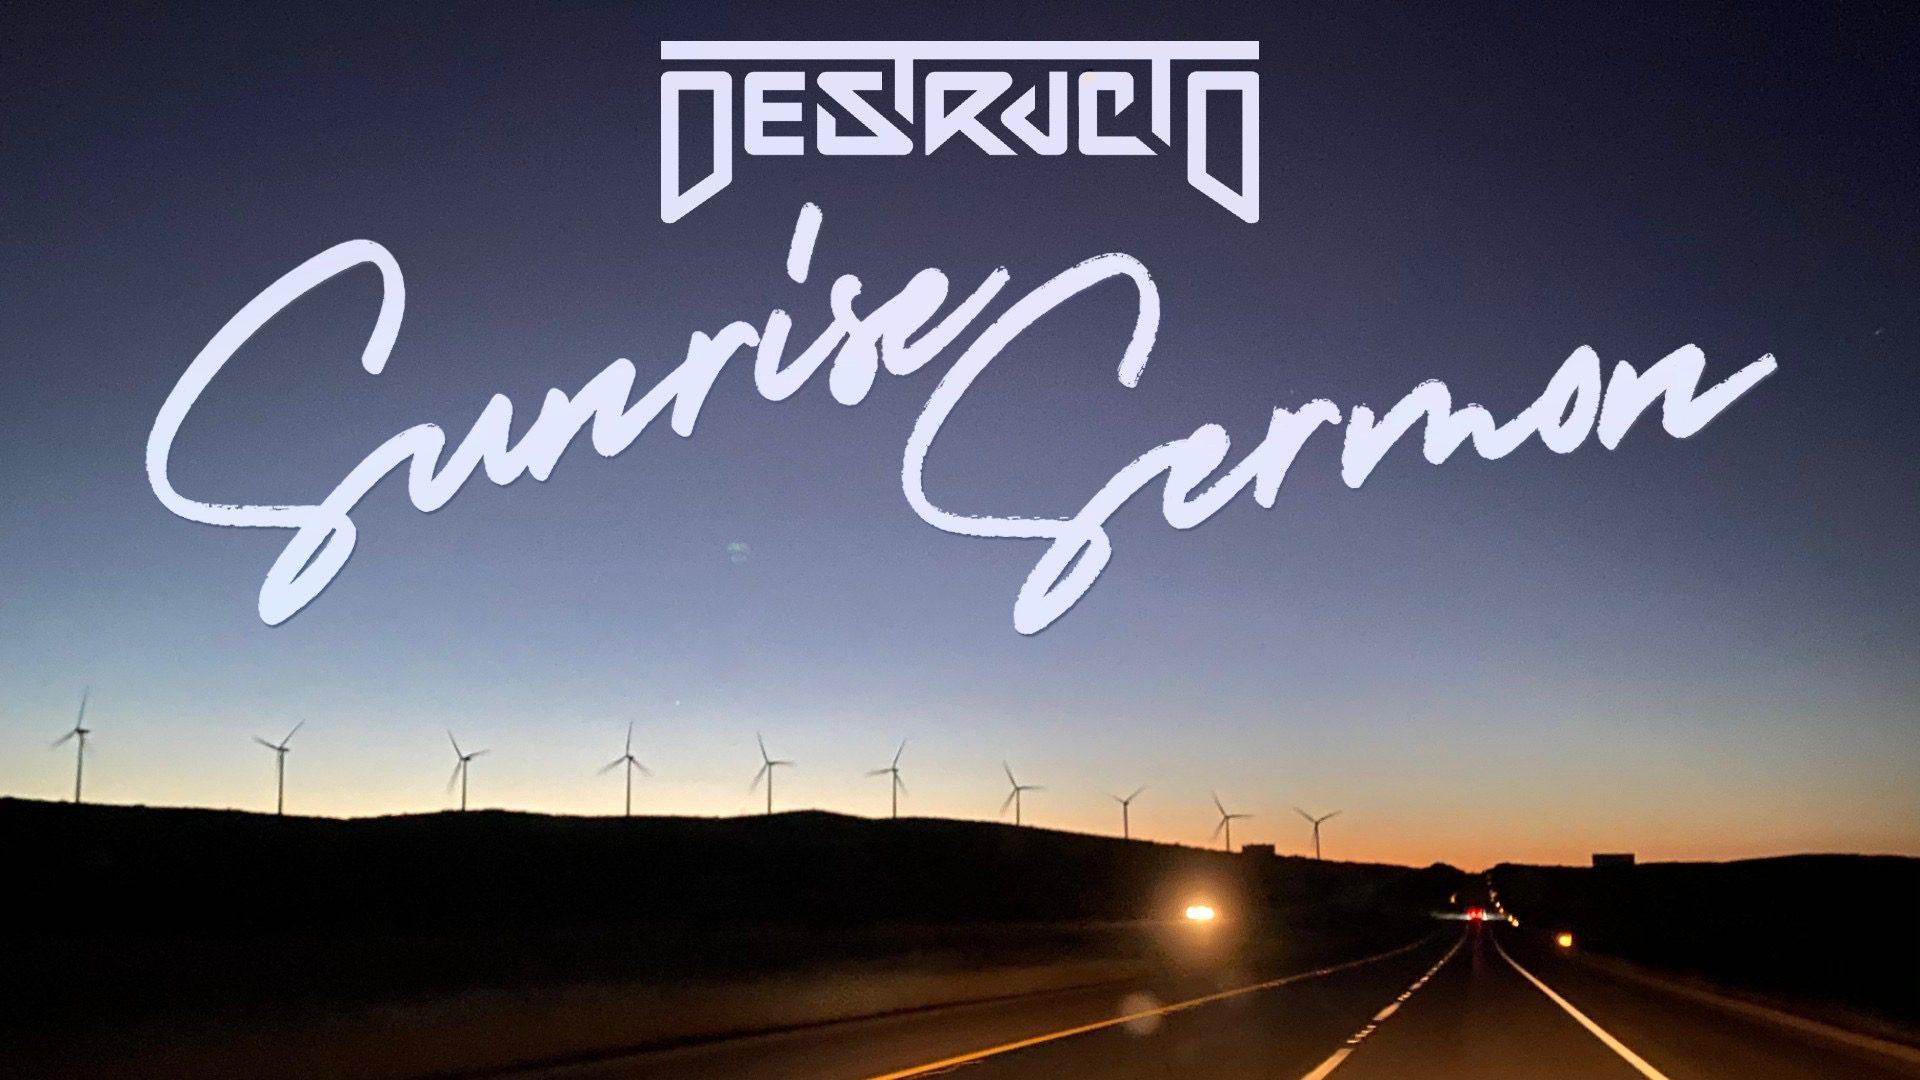 DESTRUCTO Announces Sunrise Sermon in California Desert | EDM Identity